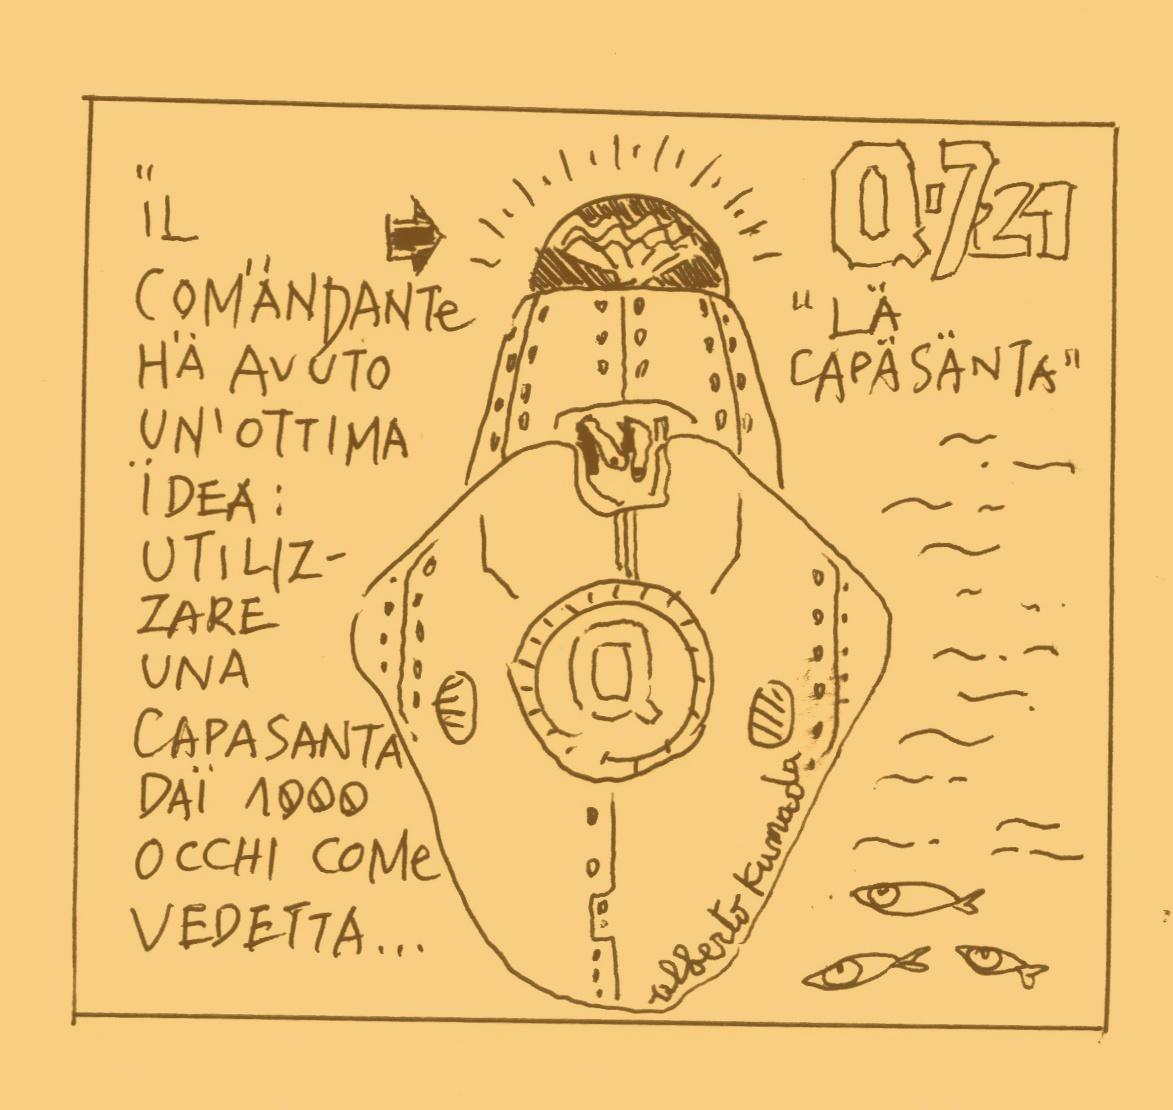 BEST webcomics Q-721